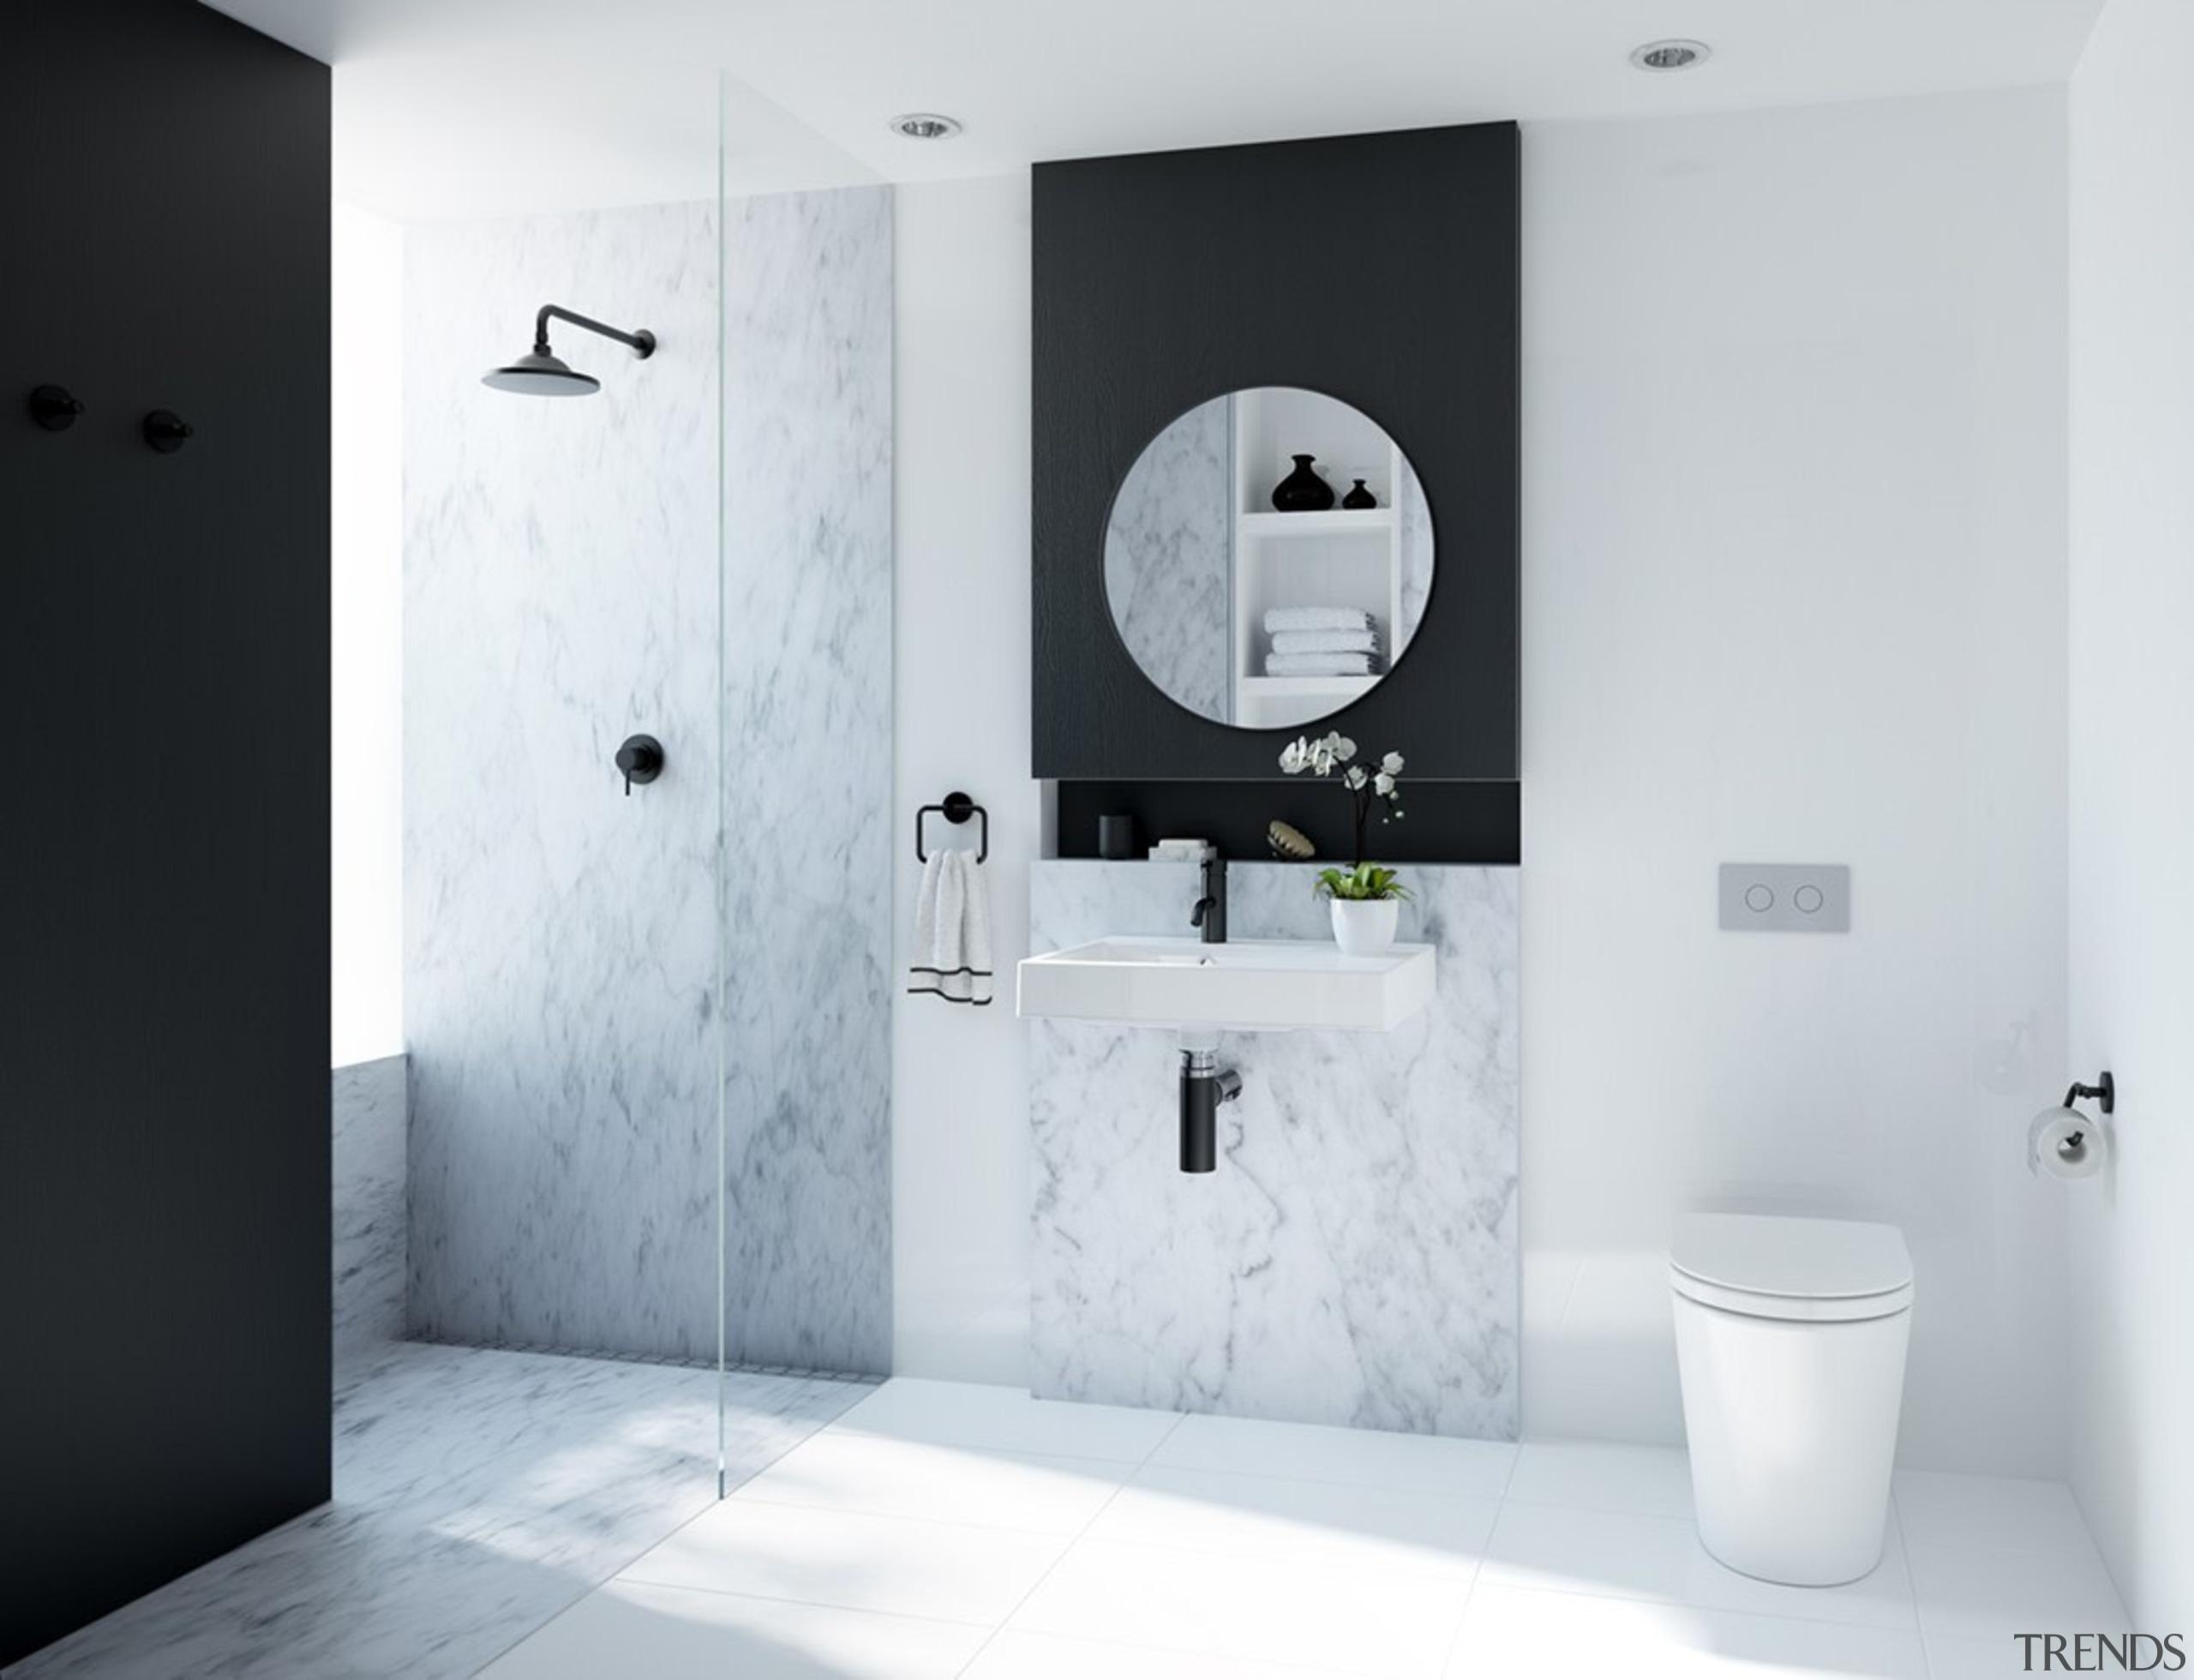 Caroma Liano Range - Caroma Liano Range - bathroom, bathroom accessory, bathroom cabinet, interior design, plumbing fixture, room, sink, tap, white